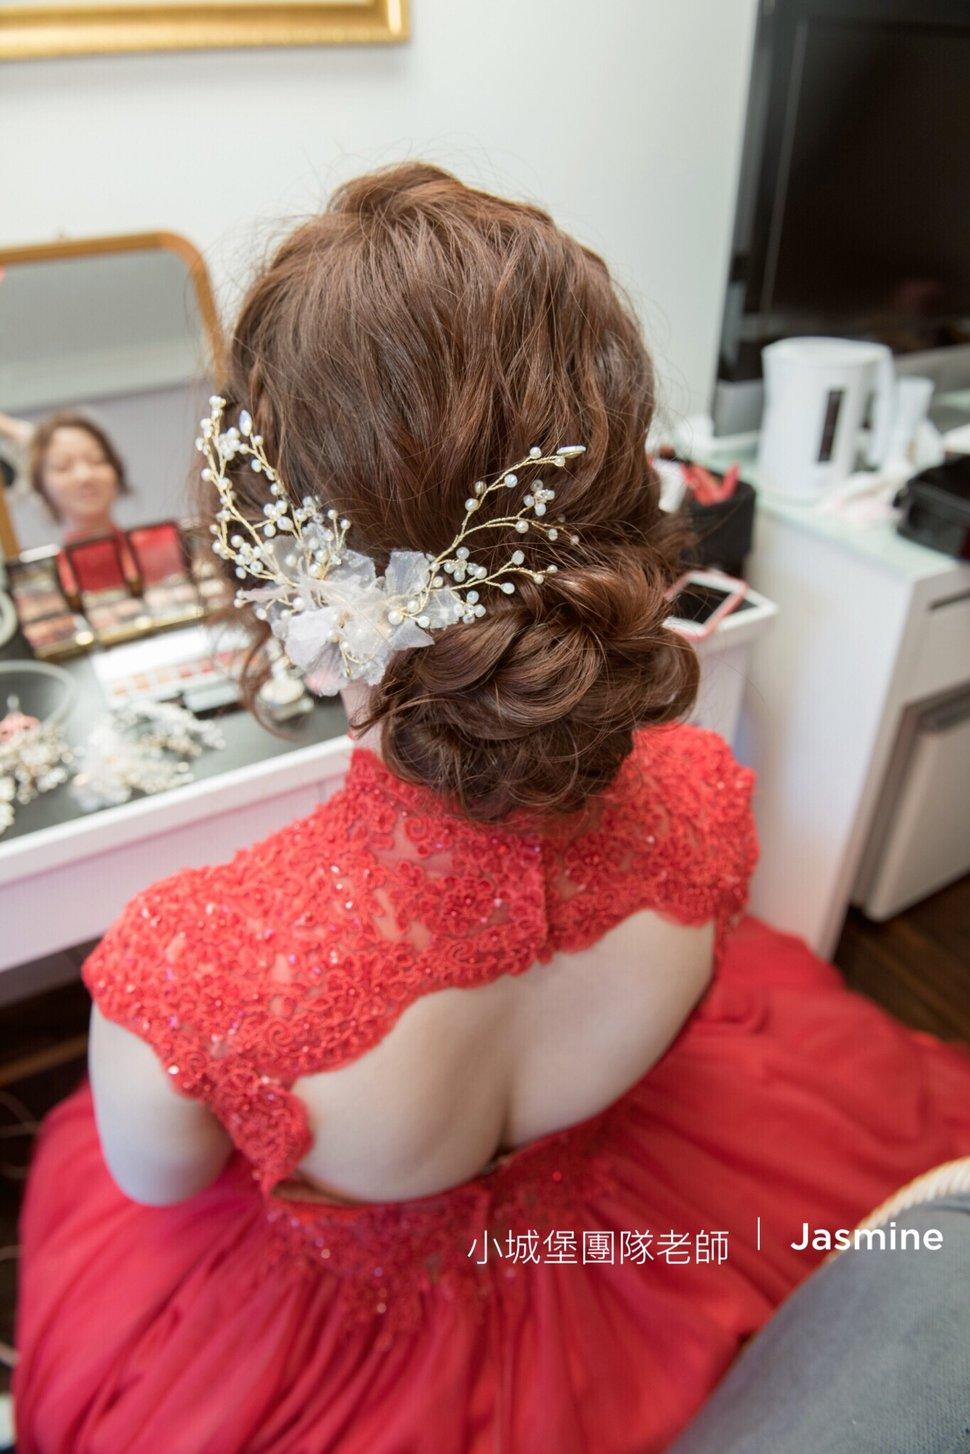 45B10666-2C6E-45EF-B3BD-0332F6D179B4 - Jasmine Makeup新娘秘書《結婚吧》